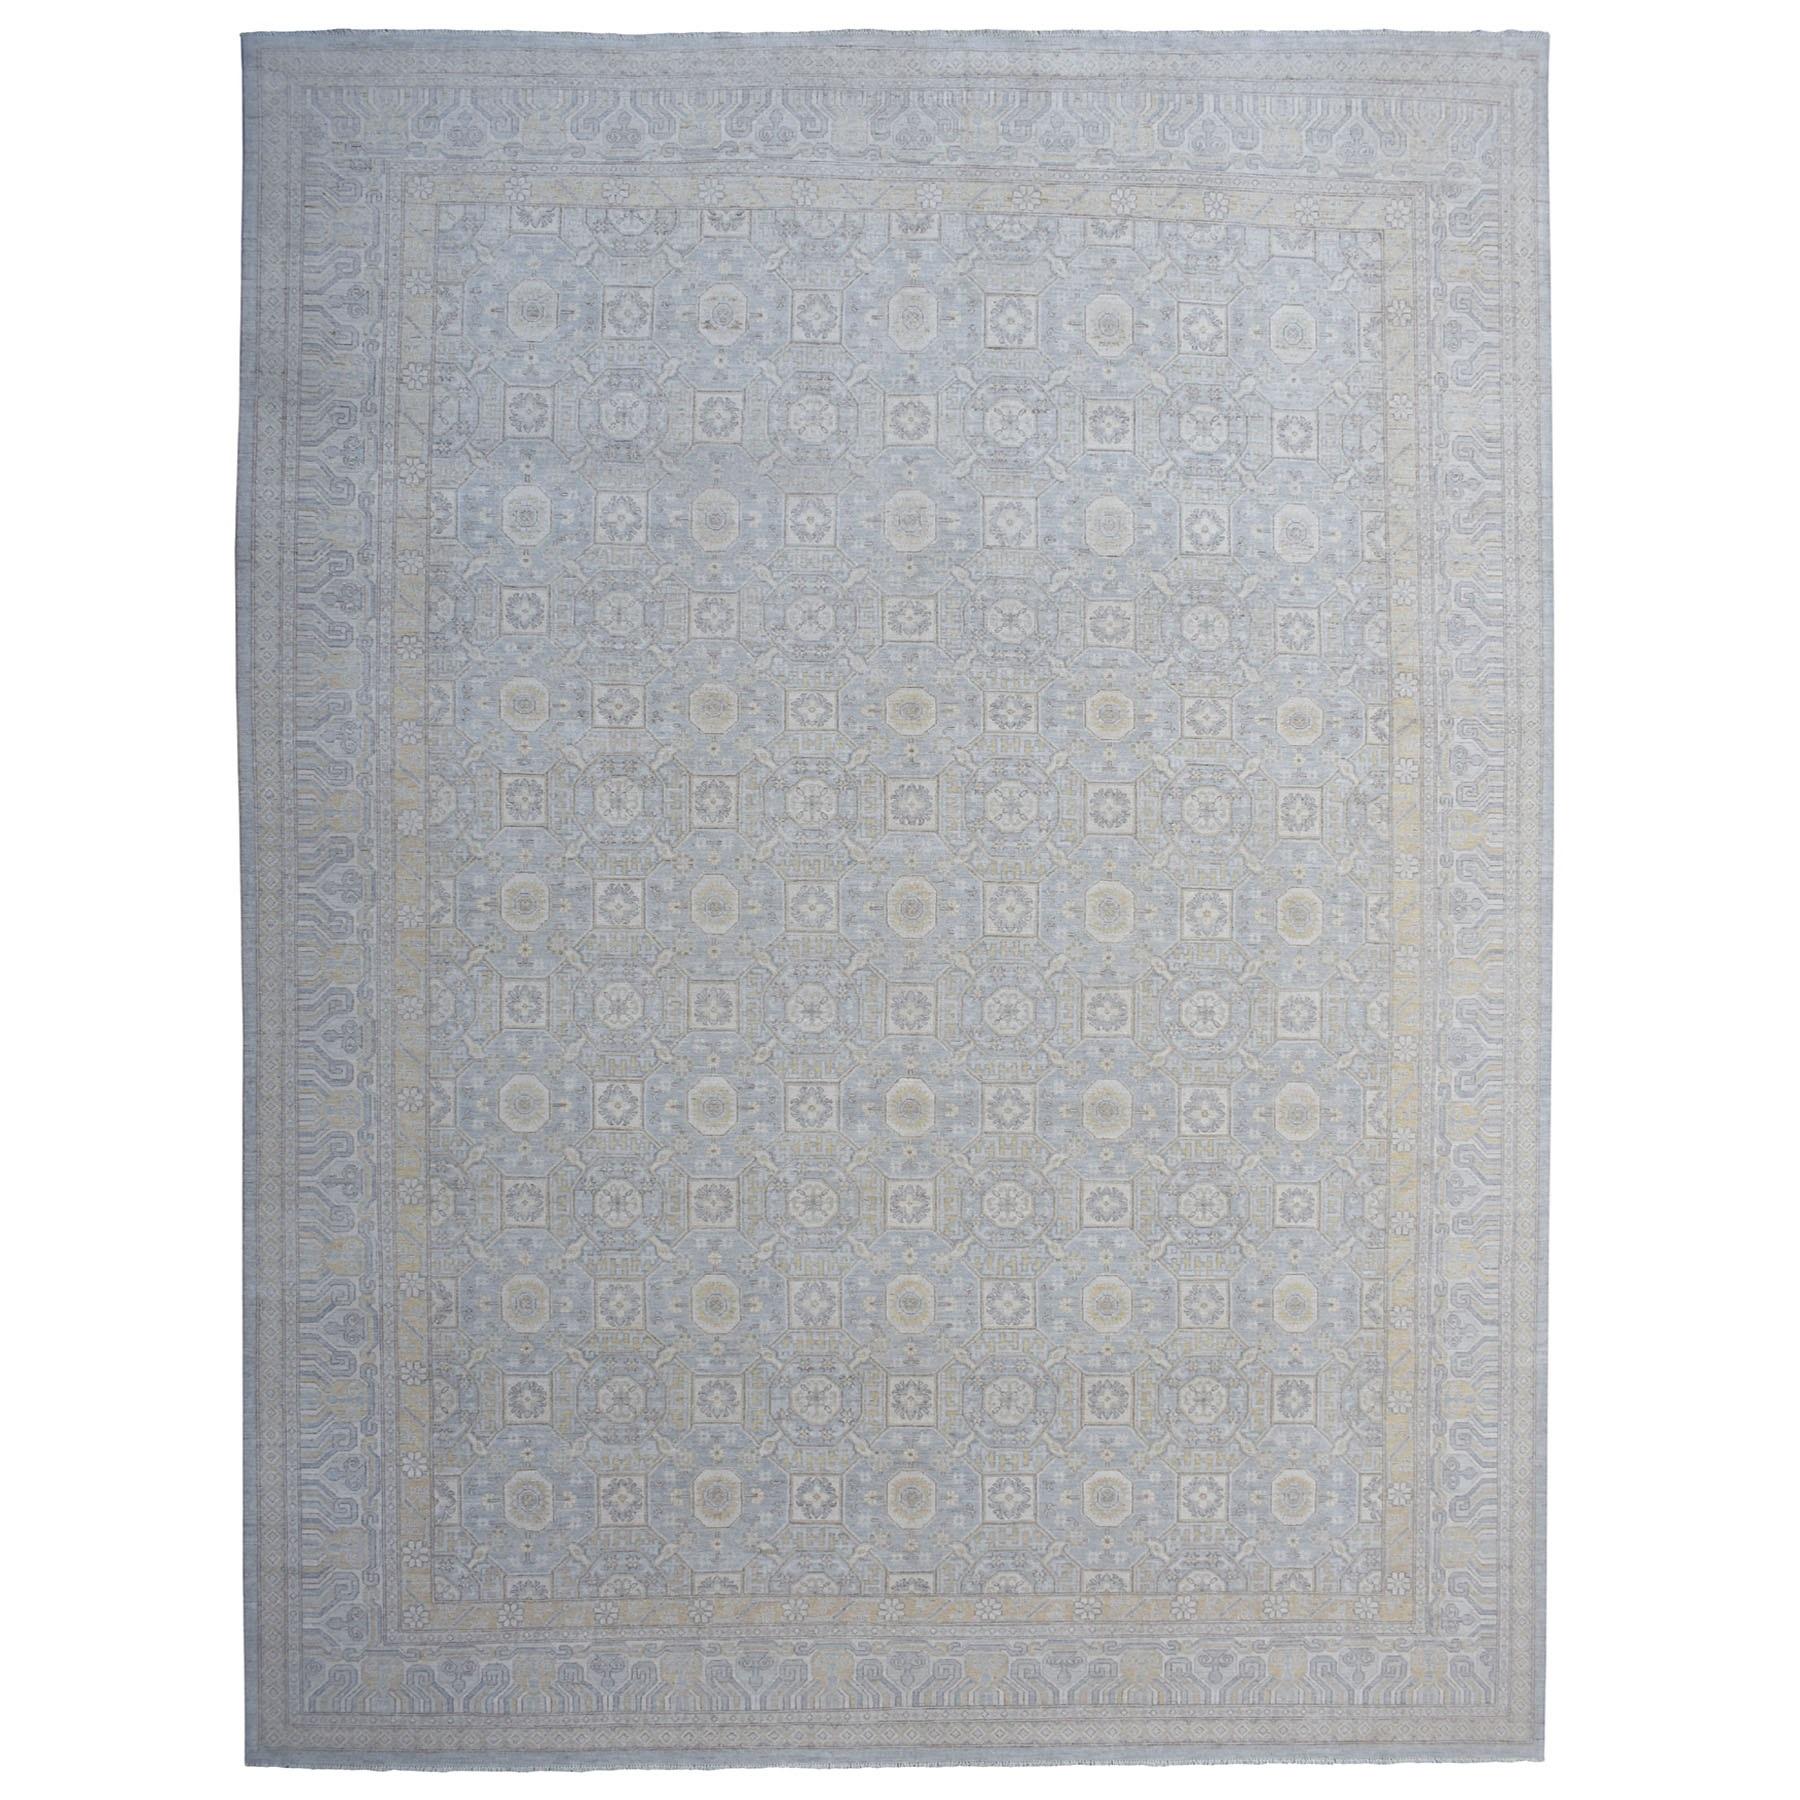 "13'2""x17'6"" Oversized Khotan Design Peshawar Silver Wash Hand Knotted Oriental Rug"